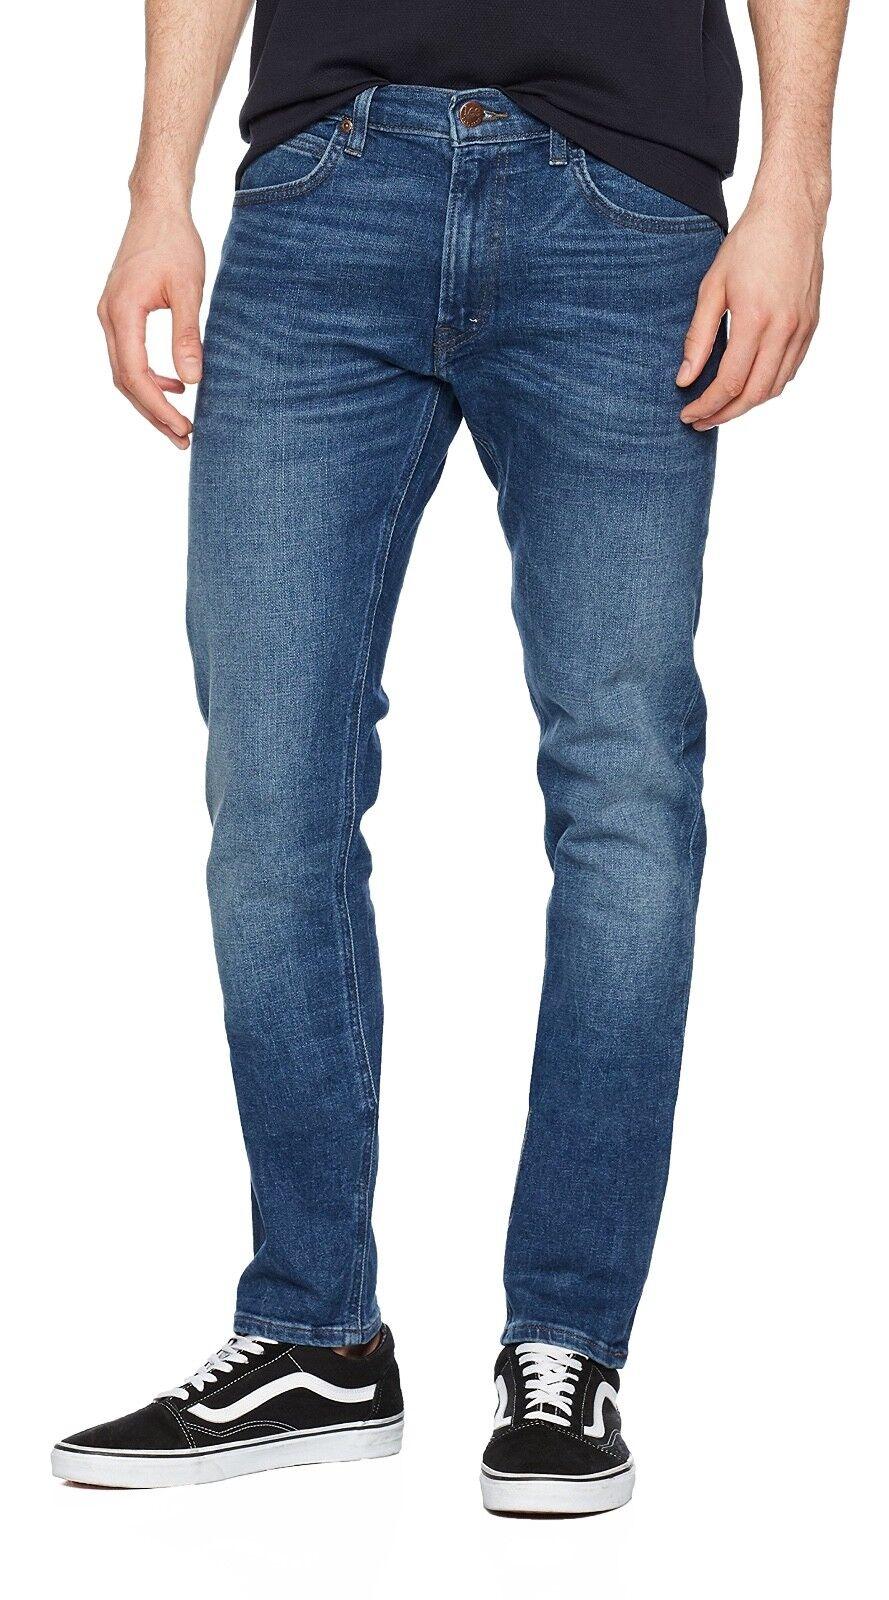 Lee Luke Slim Tapered Jeans denim nuova linea uomo Stretch Regular Rise fresca Blu